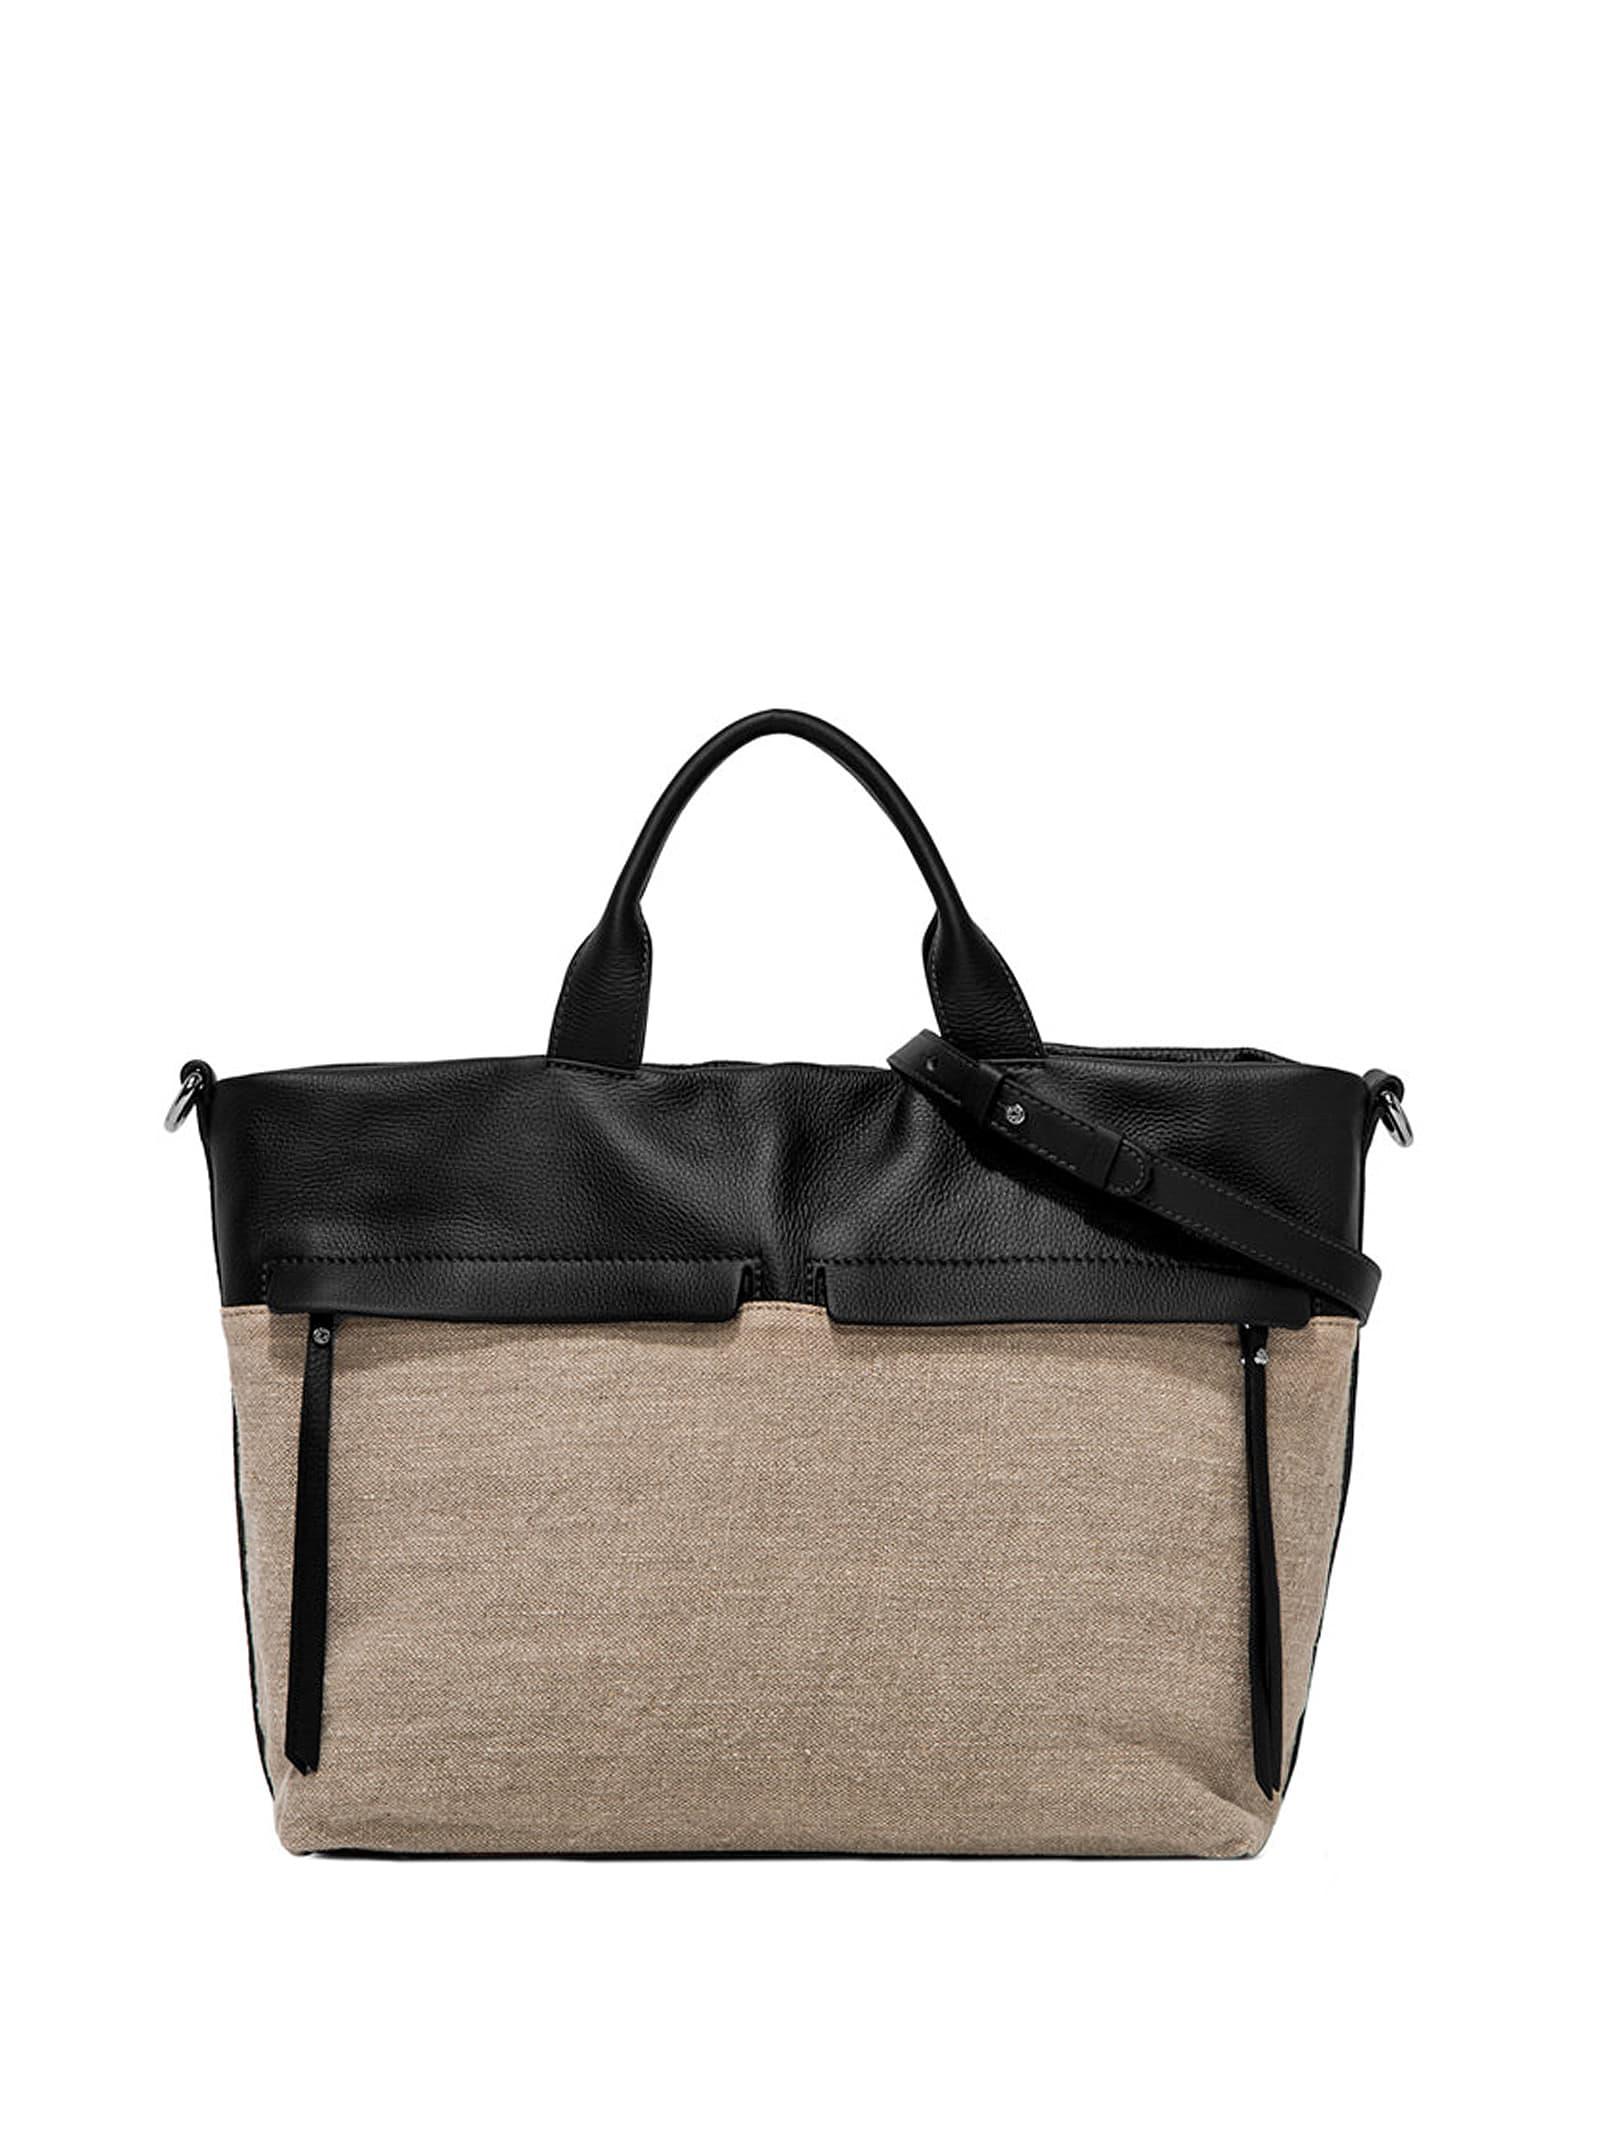 Gianni Chiarini Gianni Chiarini Duna Shopping Bag